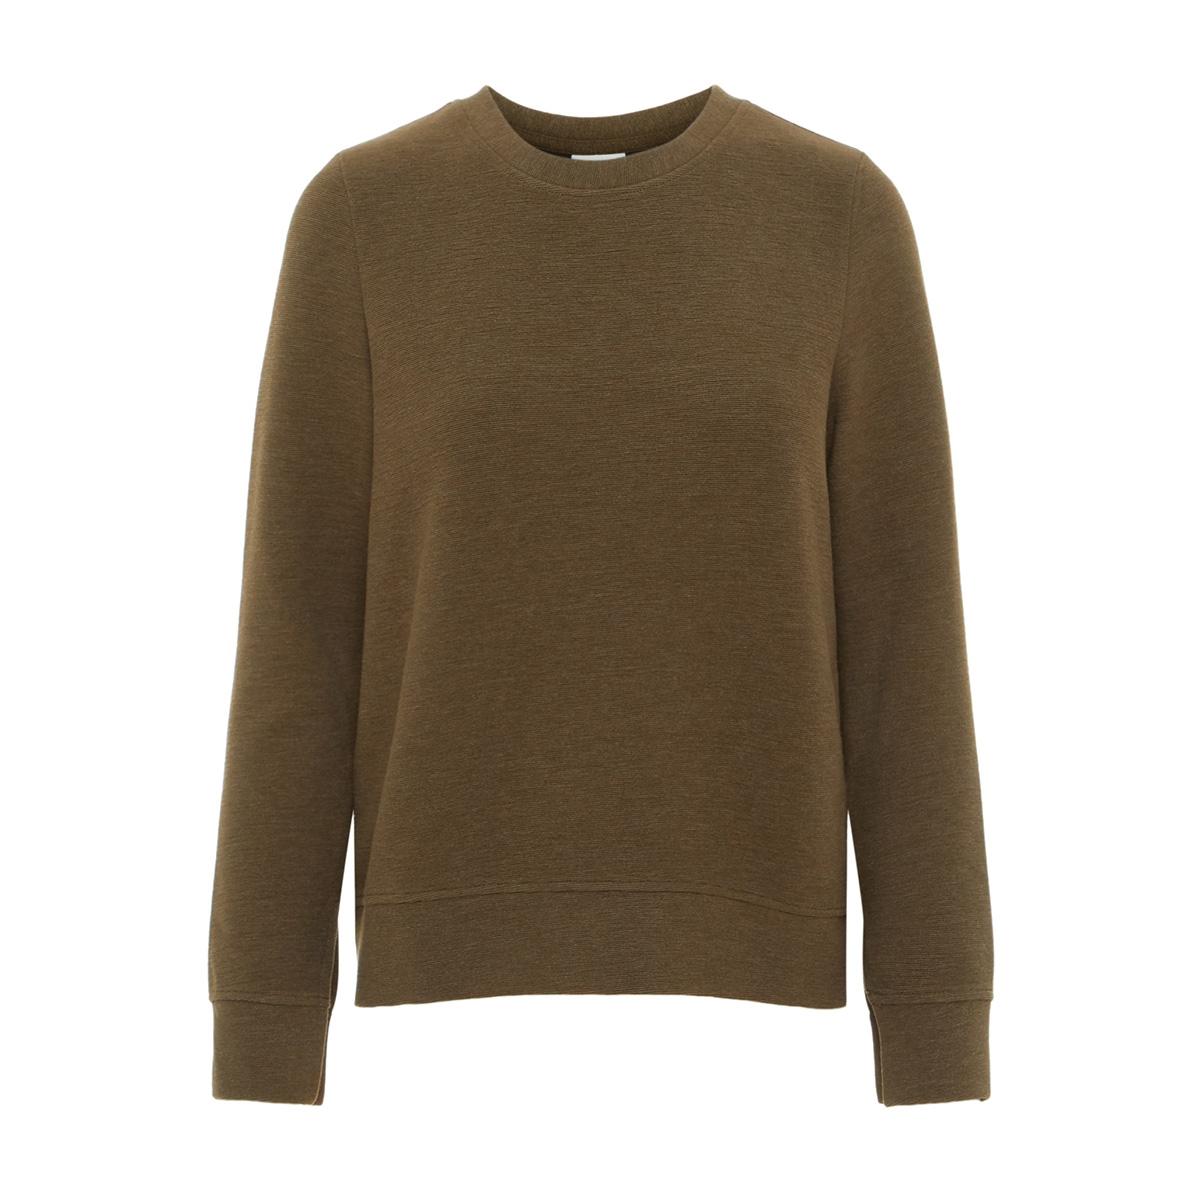 nmnera l/s sweat 8b 27005479 noisy may sweater olive night